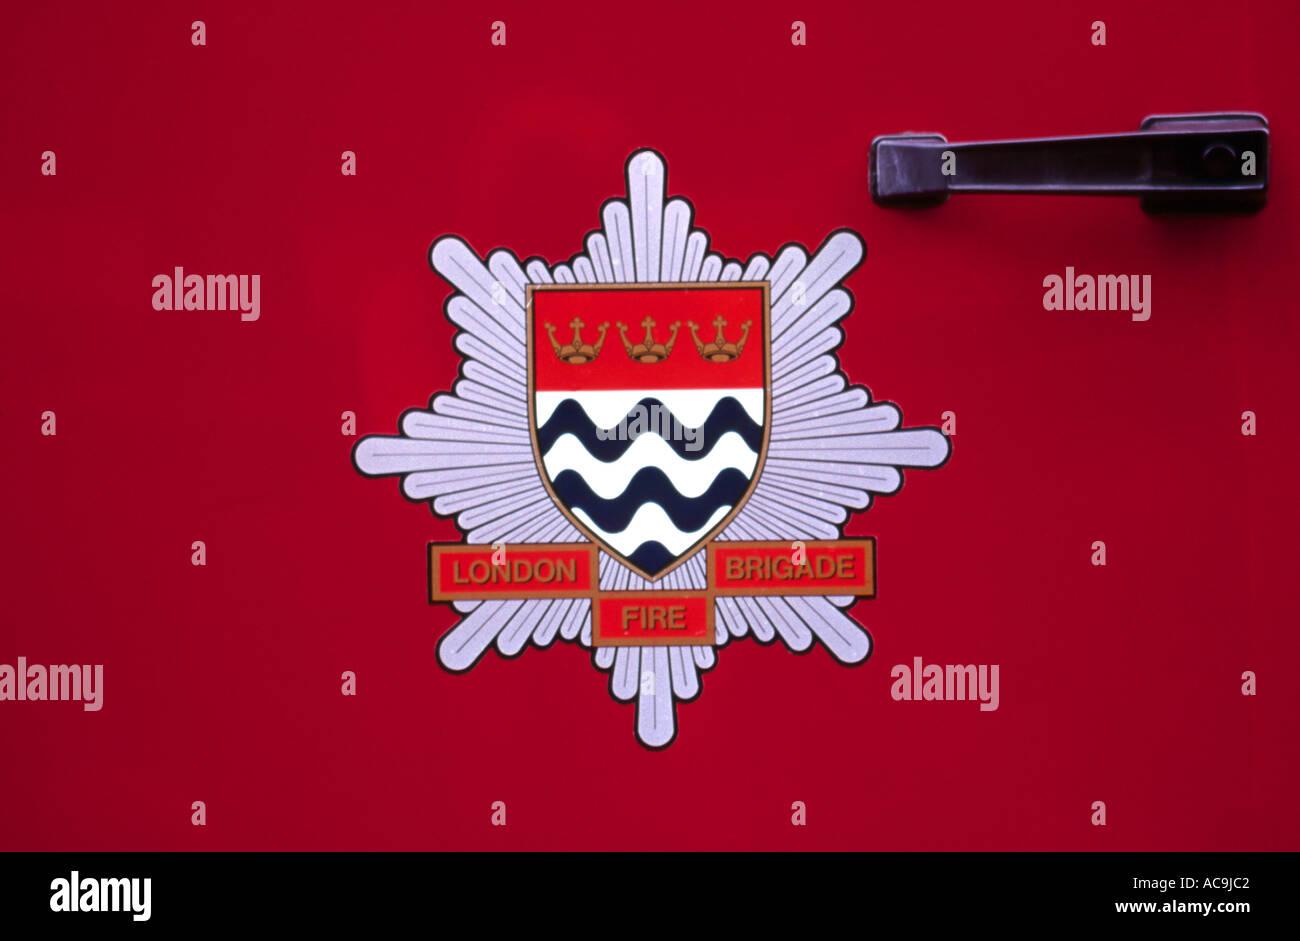 London Fire Brigade Crest - Stock Image